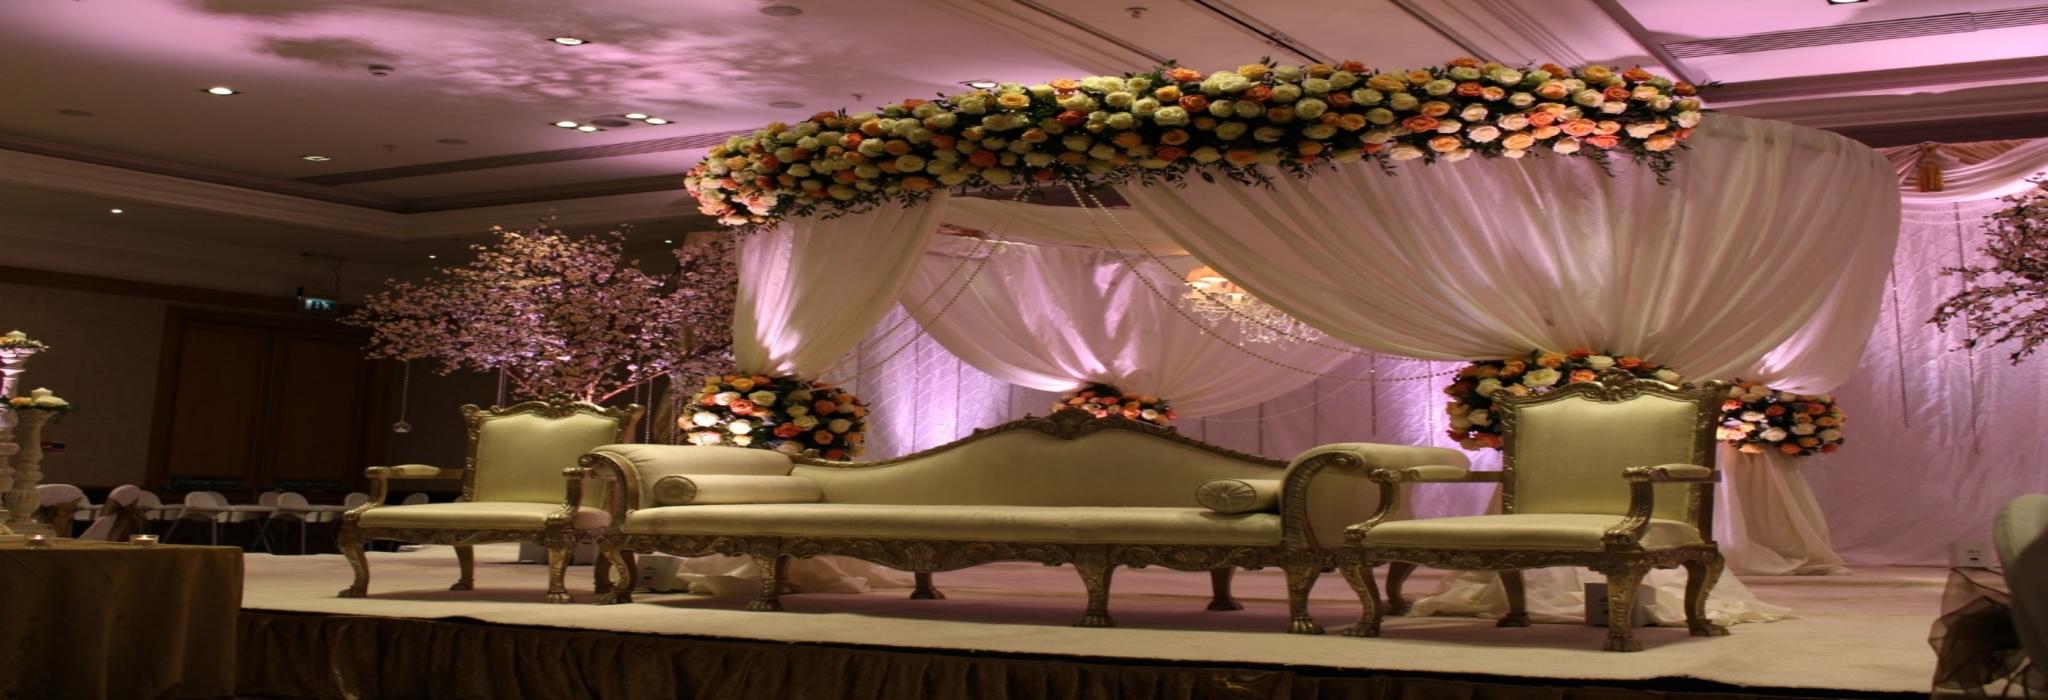 Saffron events uk for Asian wedding stage decoration manchester